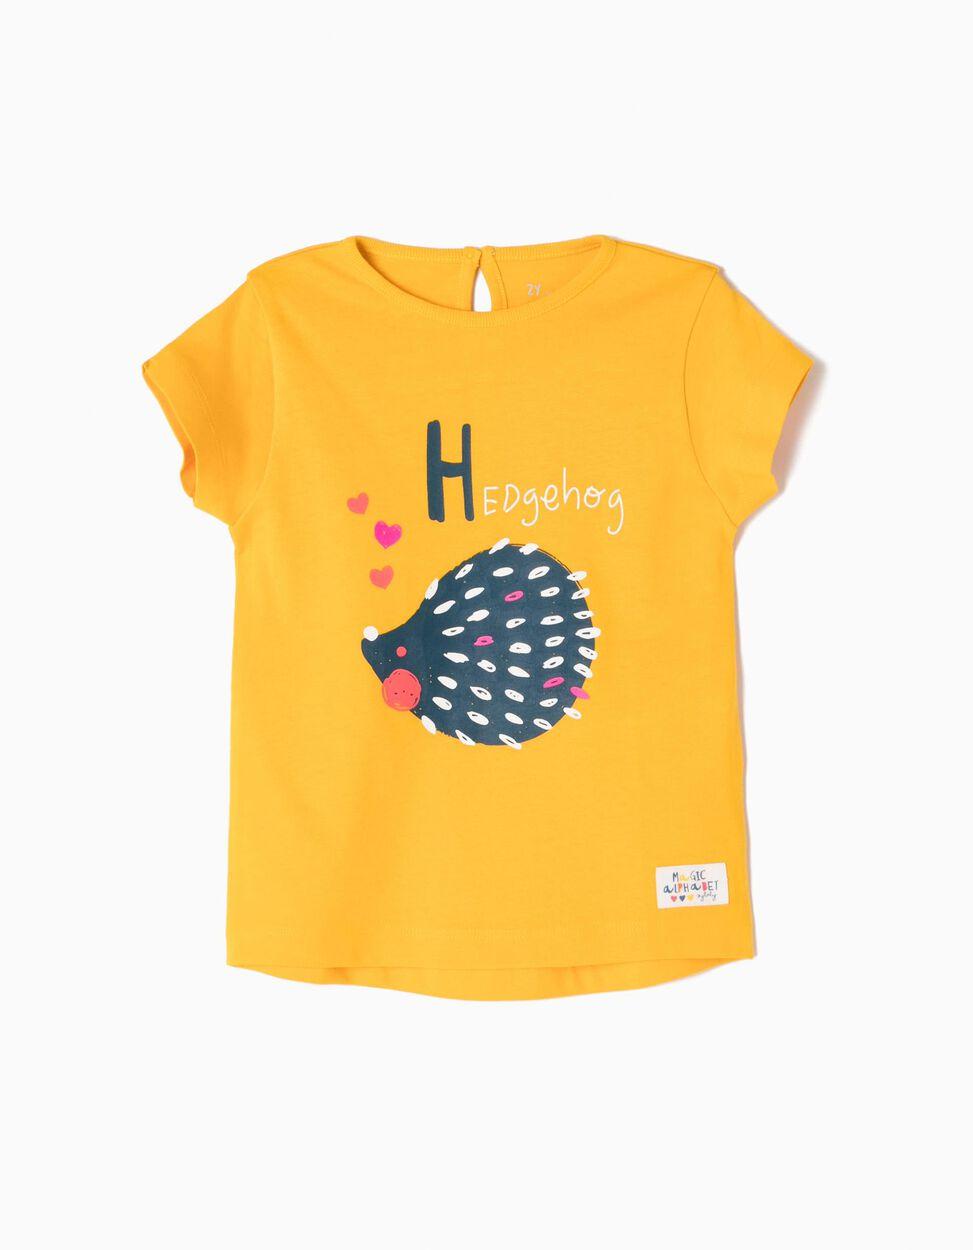 Camiseta estampada Hedgehog